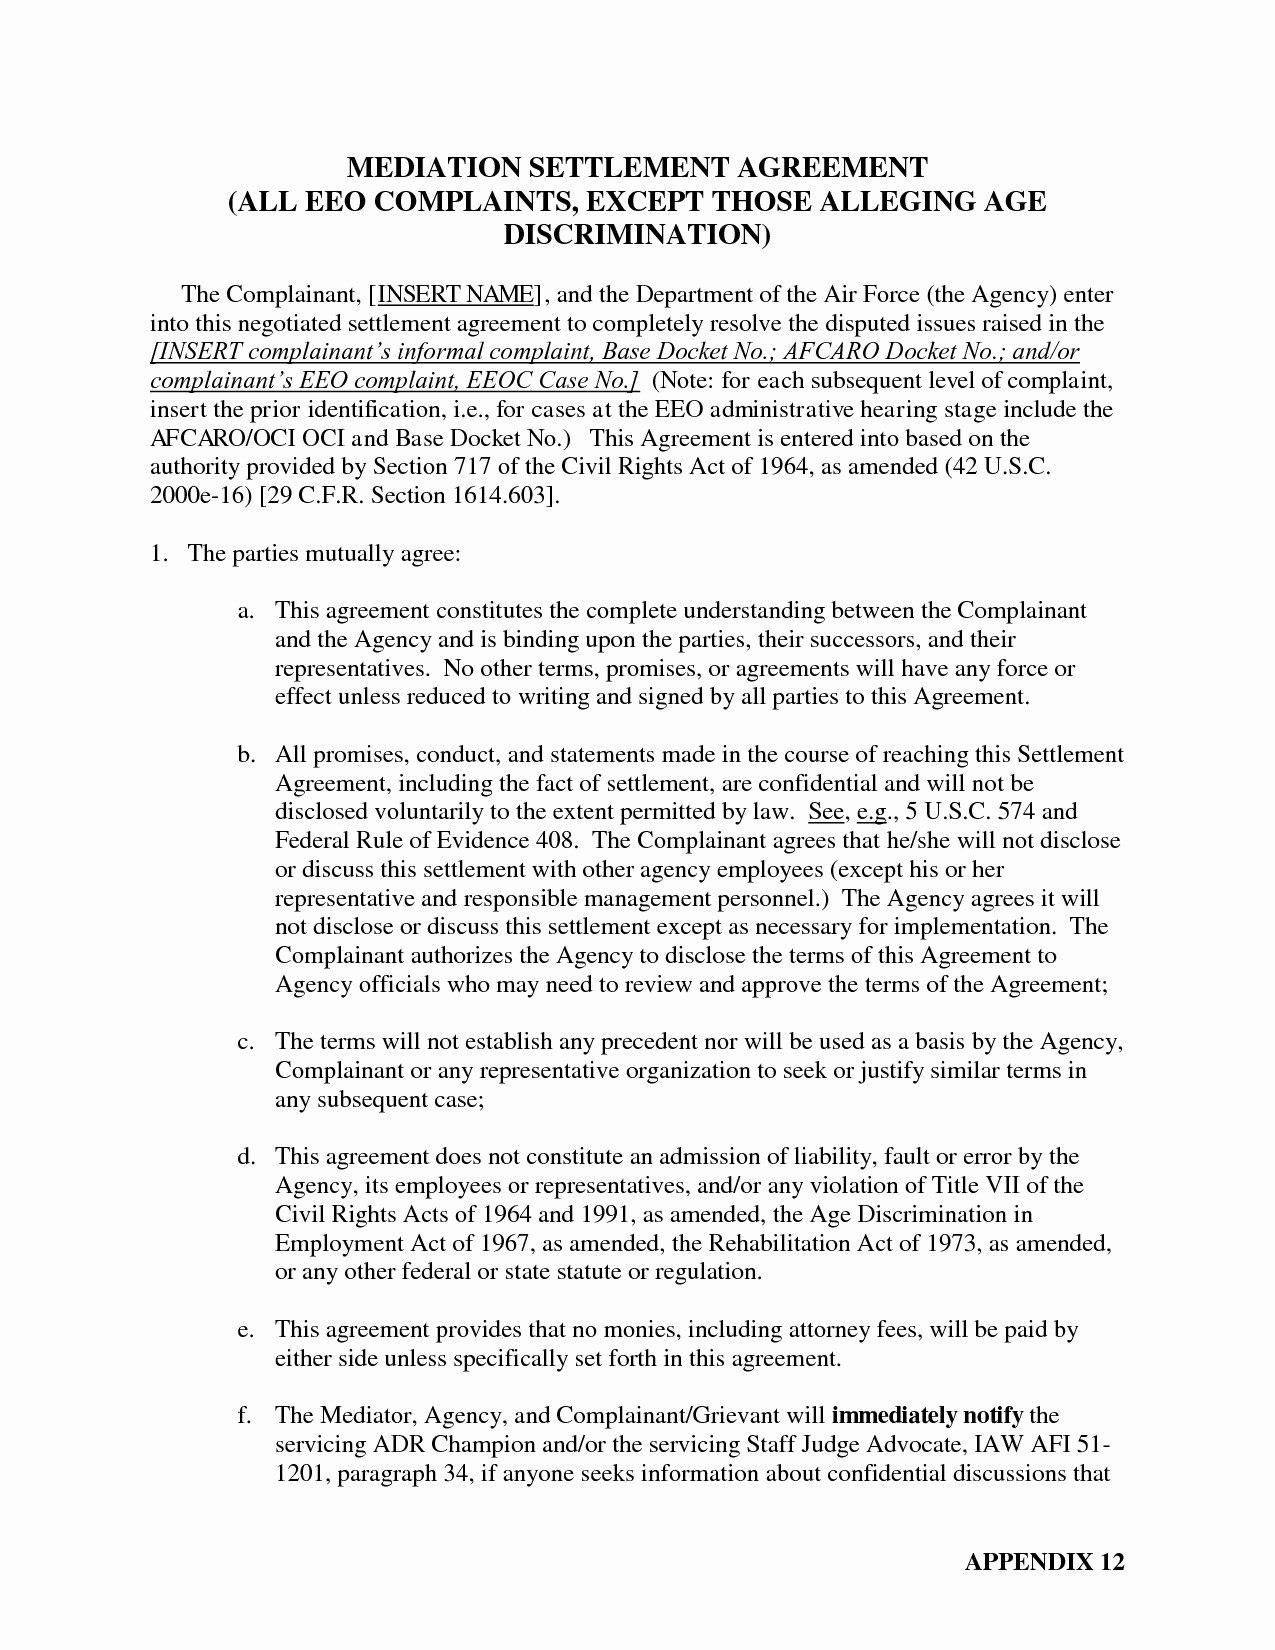 Sample Mediation Settlement Agreement  Lera Mera For Divorce Mediation Agreement Template